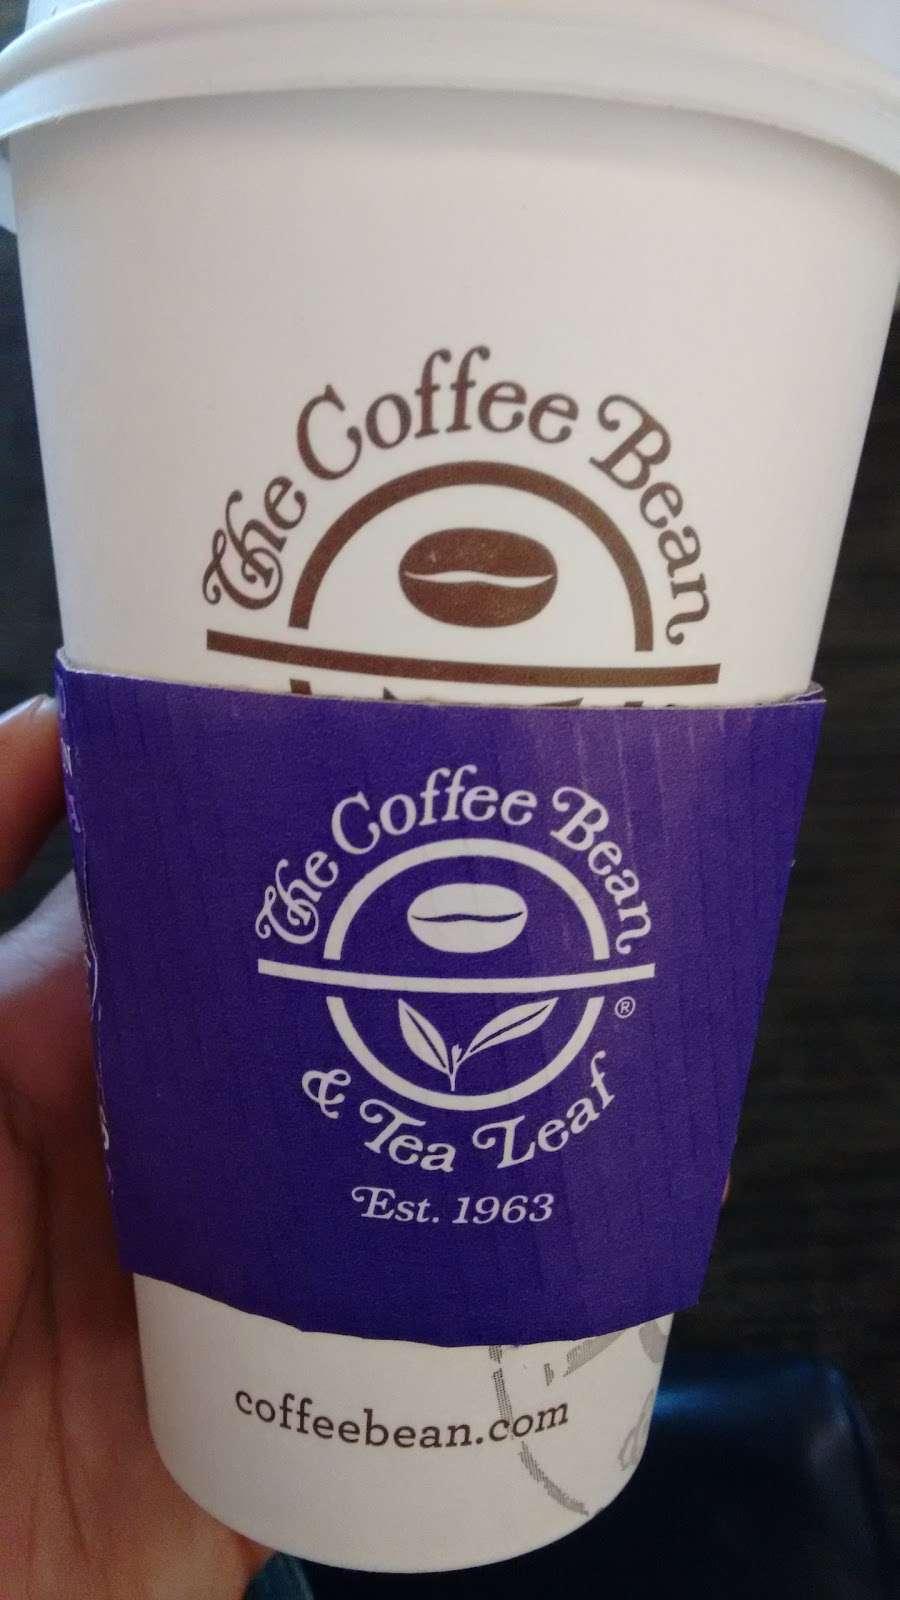 The Coffee Bean & Tea Leaf - cafe  | Photo 5 of 10 | Address: 550 World Way, Los Angeles, CA 90045, USA | Phone: (310) 337-1011